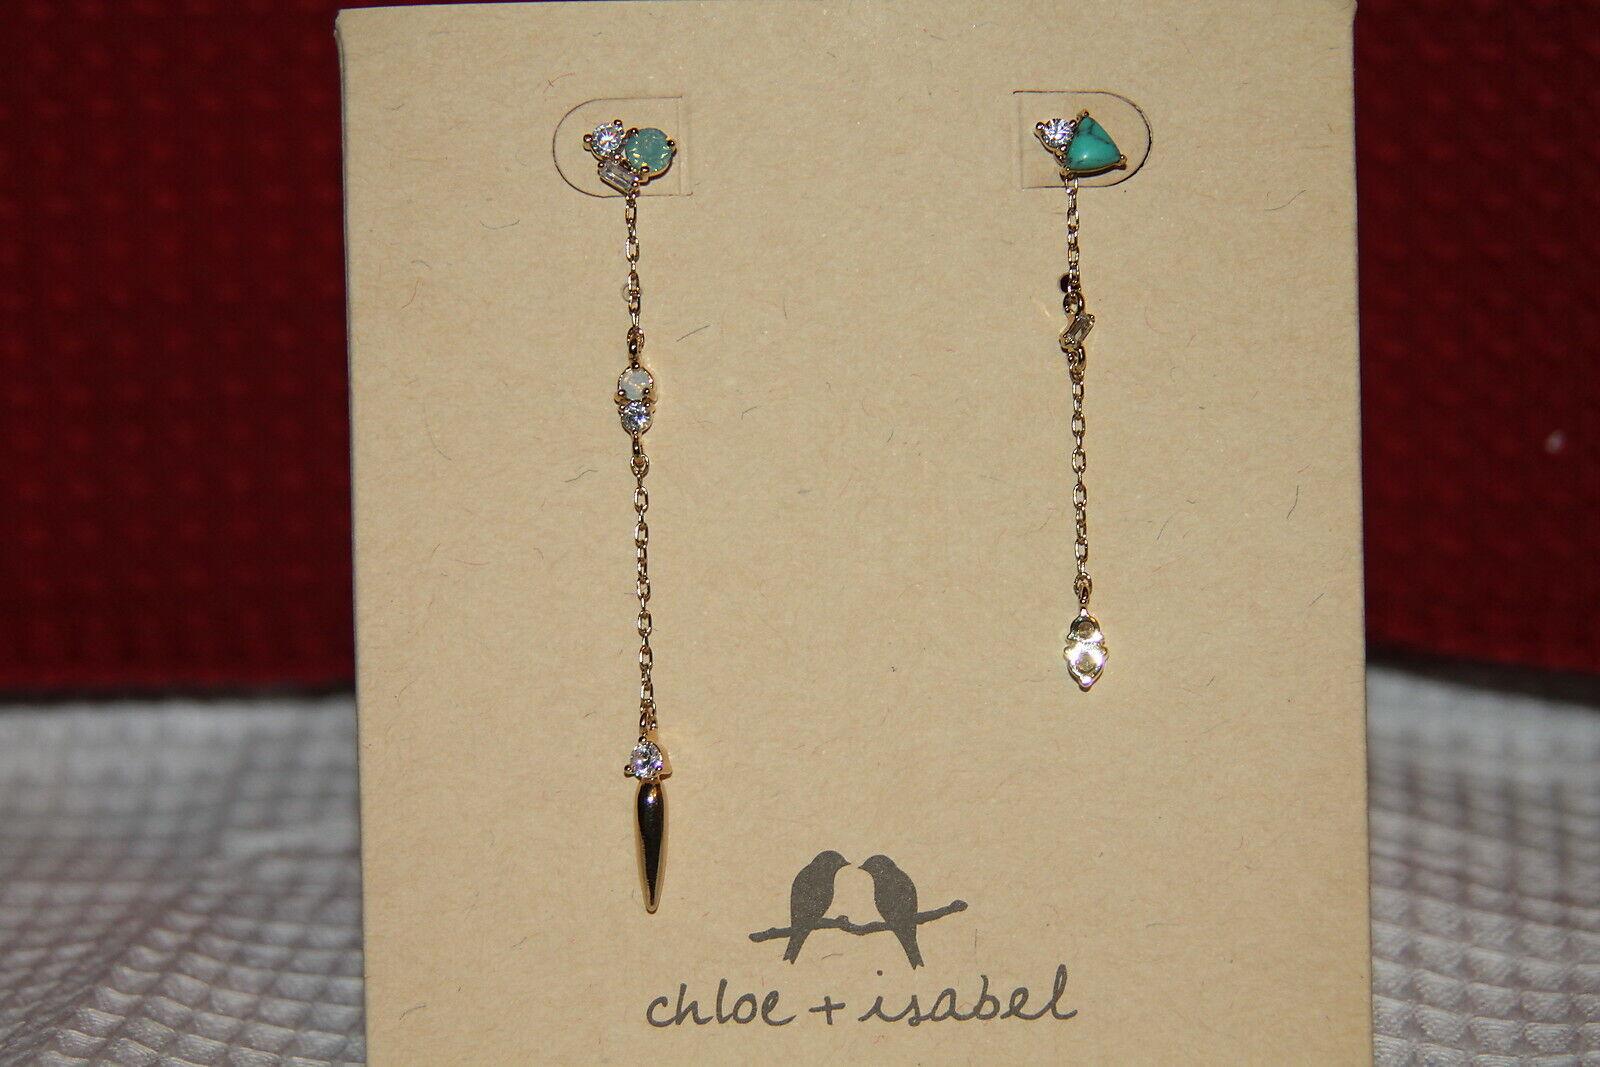 Chloe & Isabel Earrings (new) PETITE BIJOUX CRYSTAL CLUSTER MISMATCHE (E441GRSG)